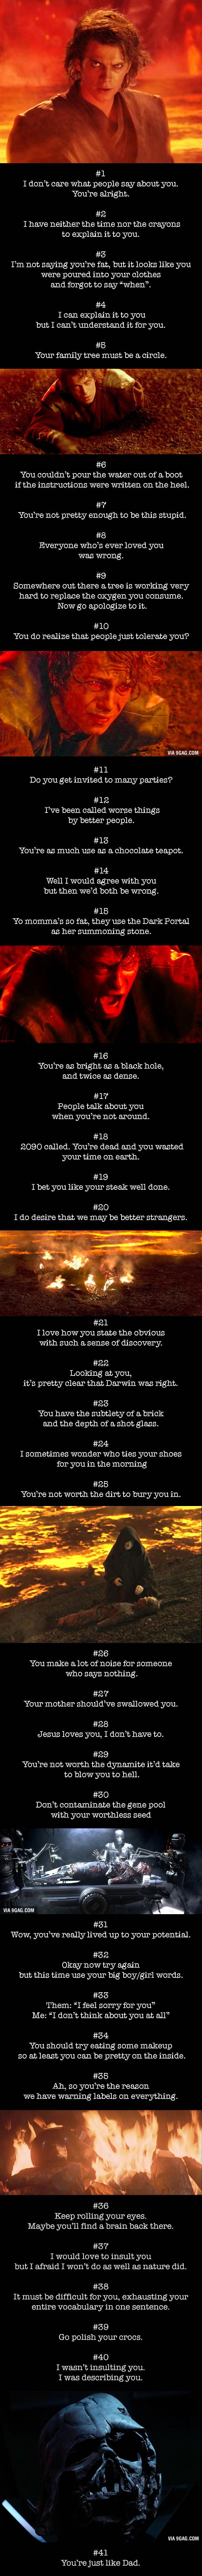 41 Curse-Free Comebacks That Burn Like Fire - 9GAG